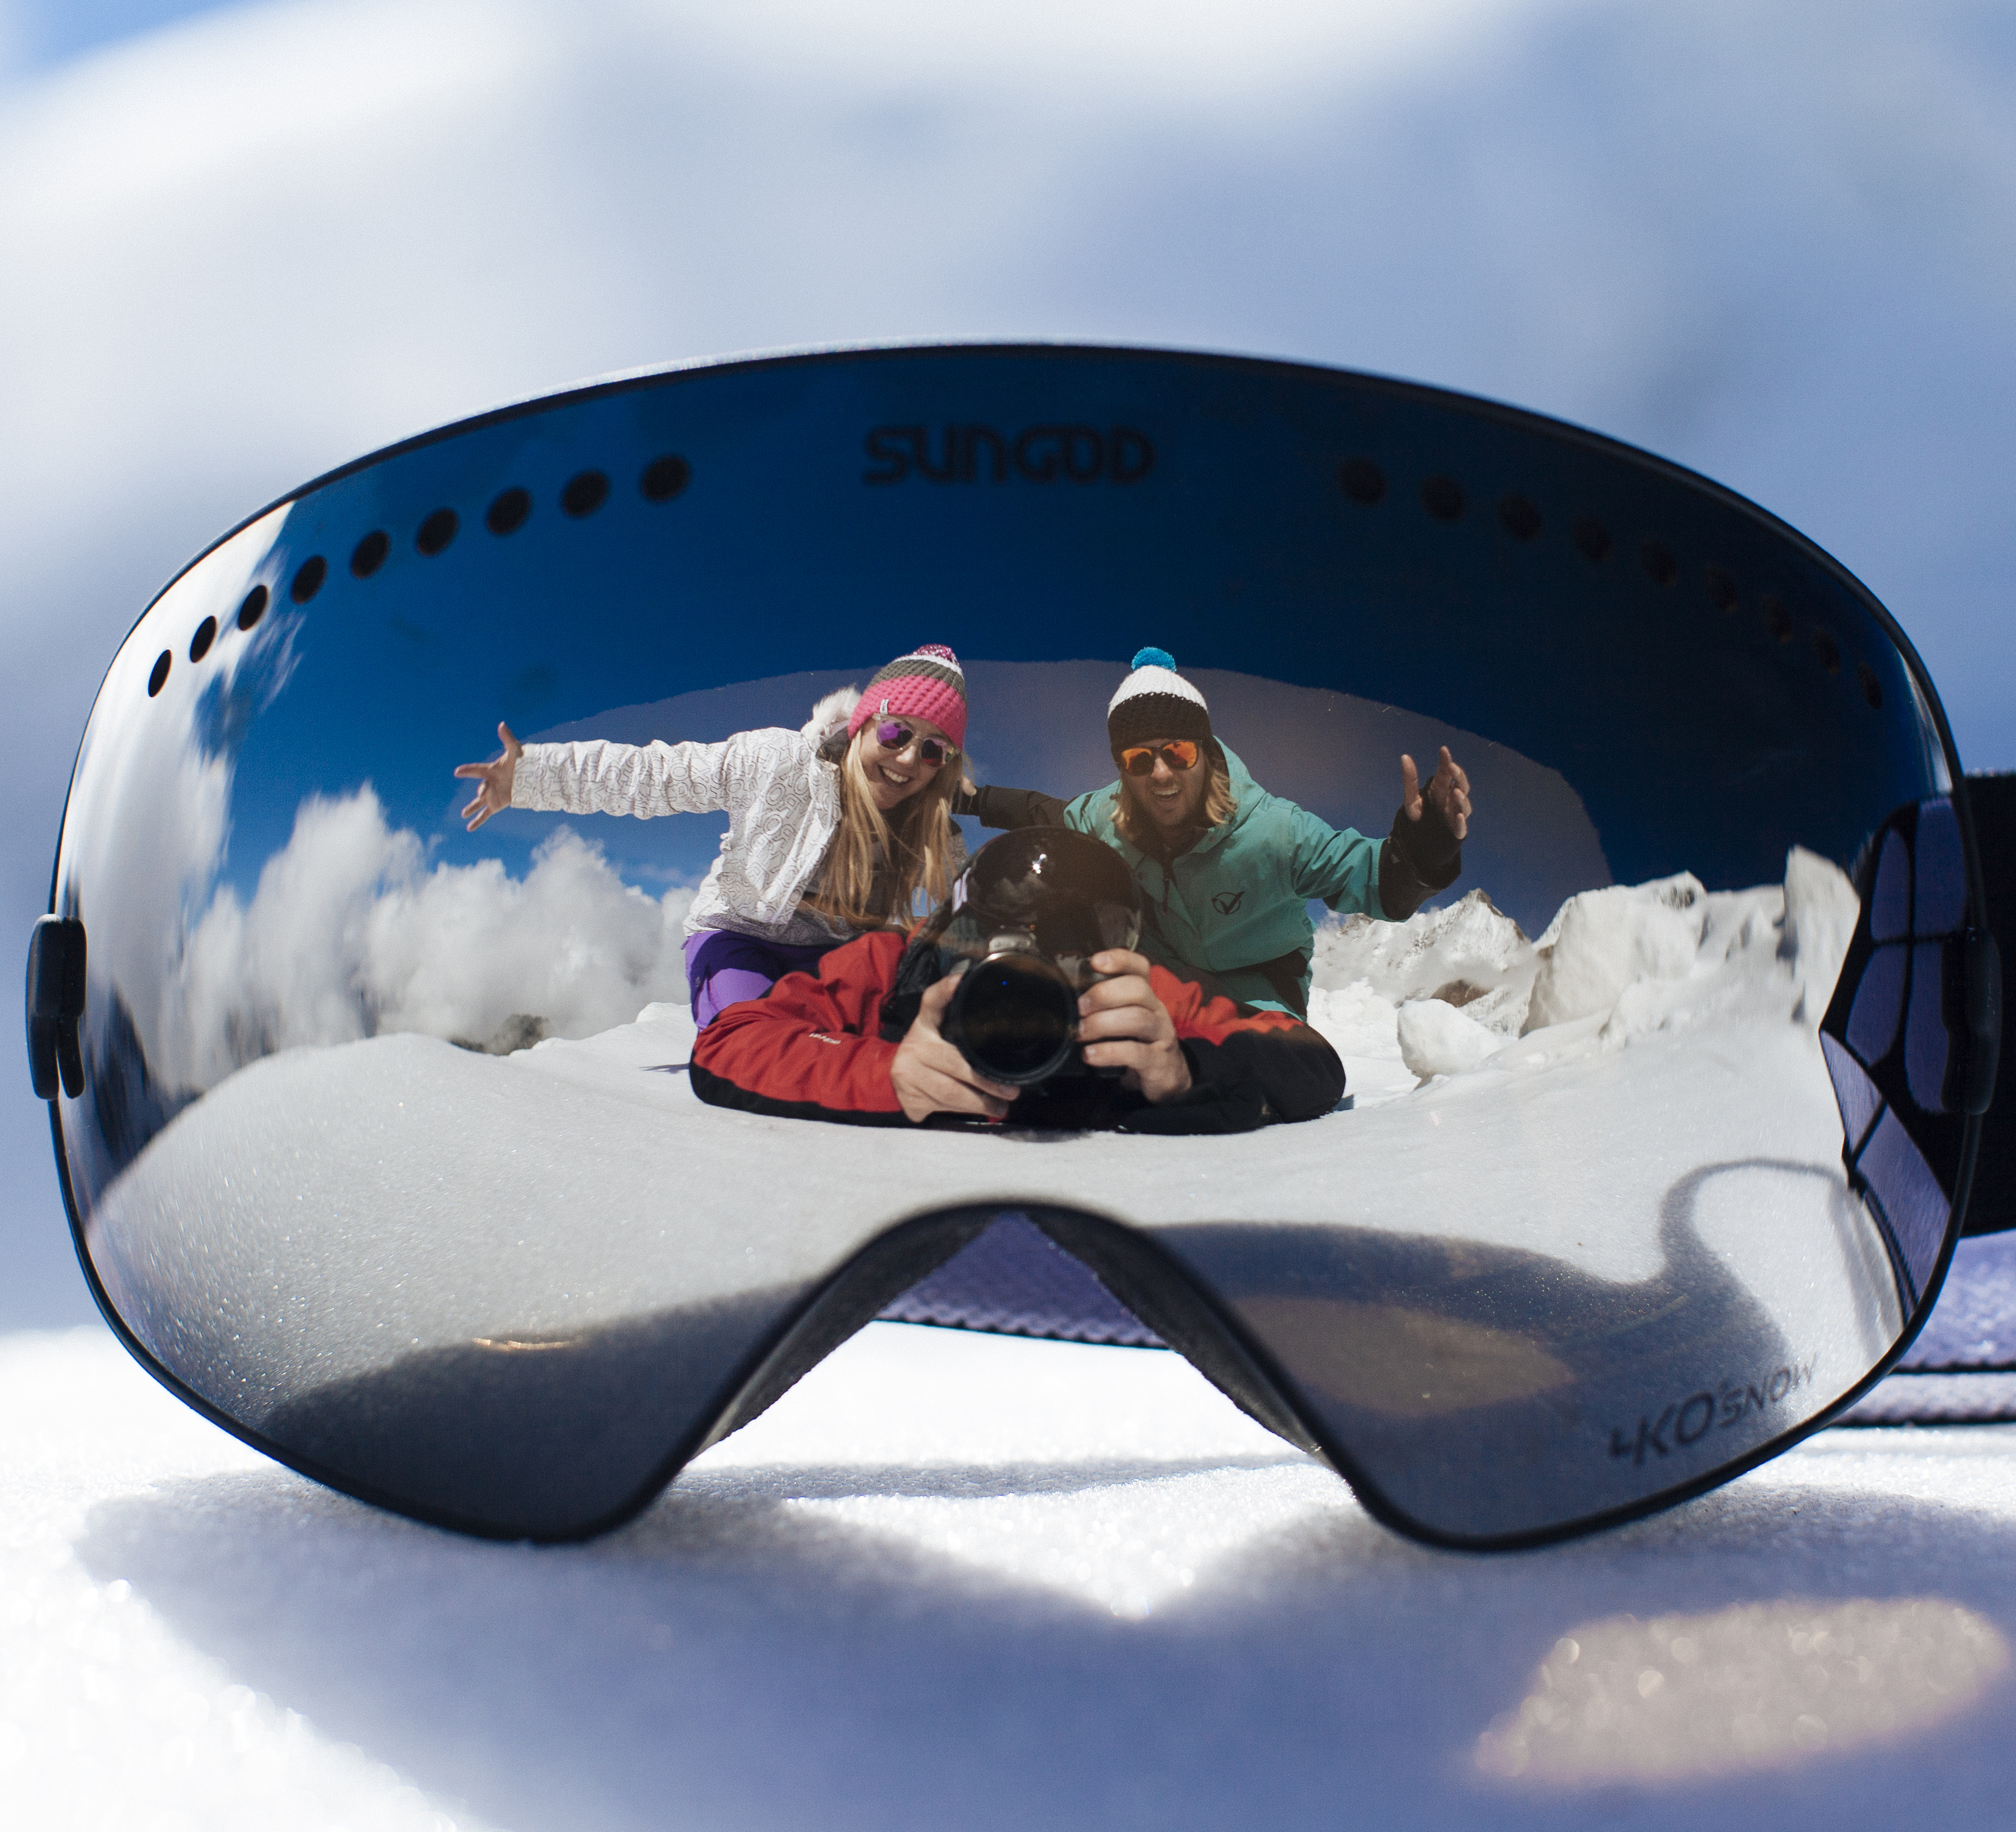 Masque de ski SunGod Revolt : mon avis (+code promo)